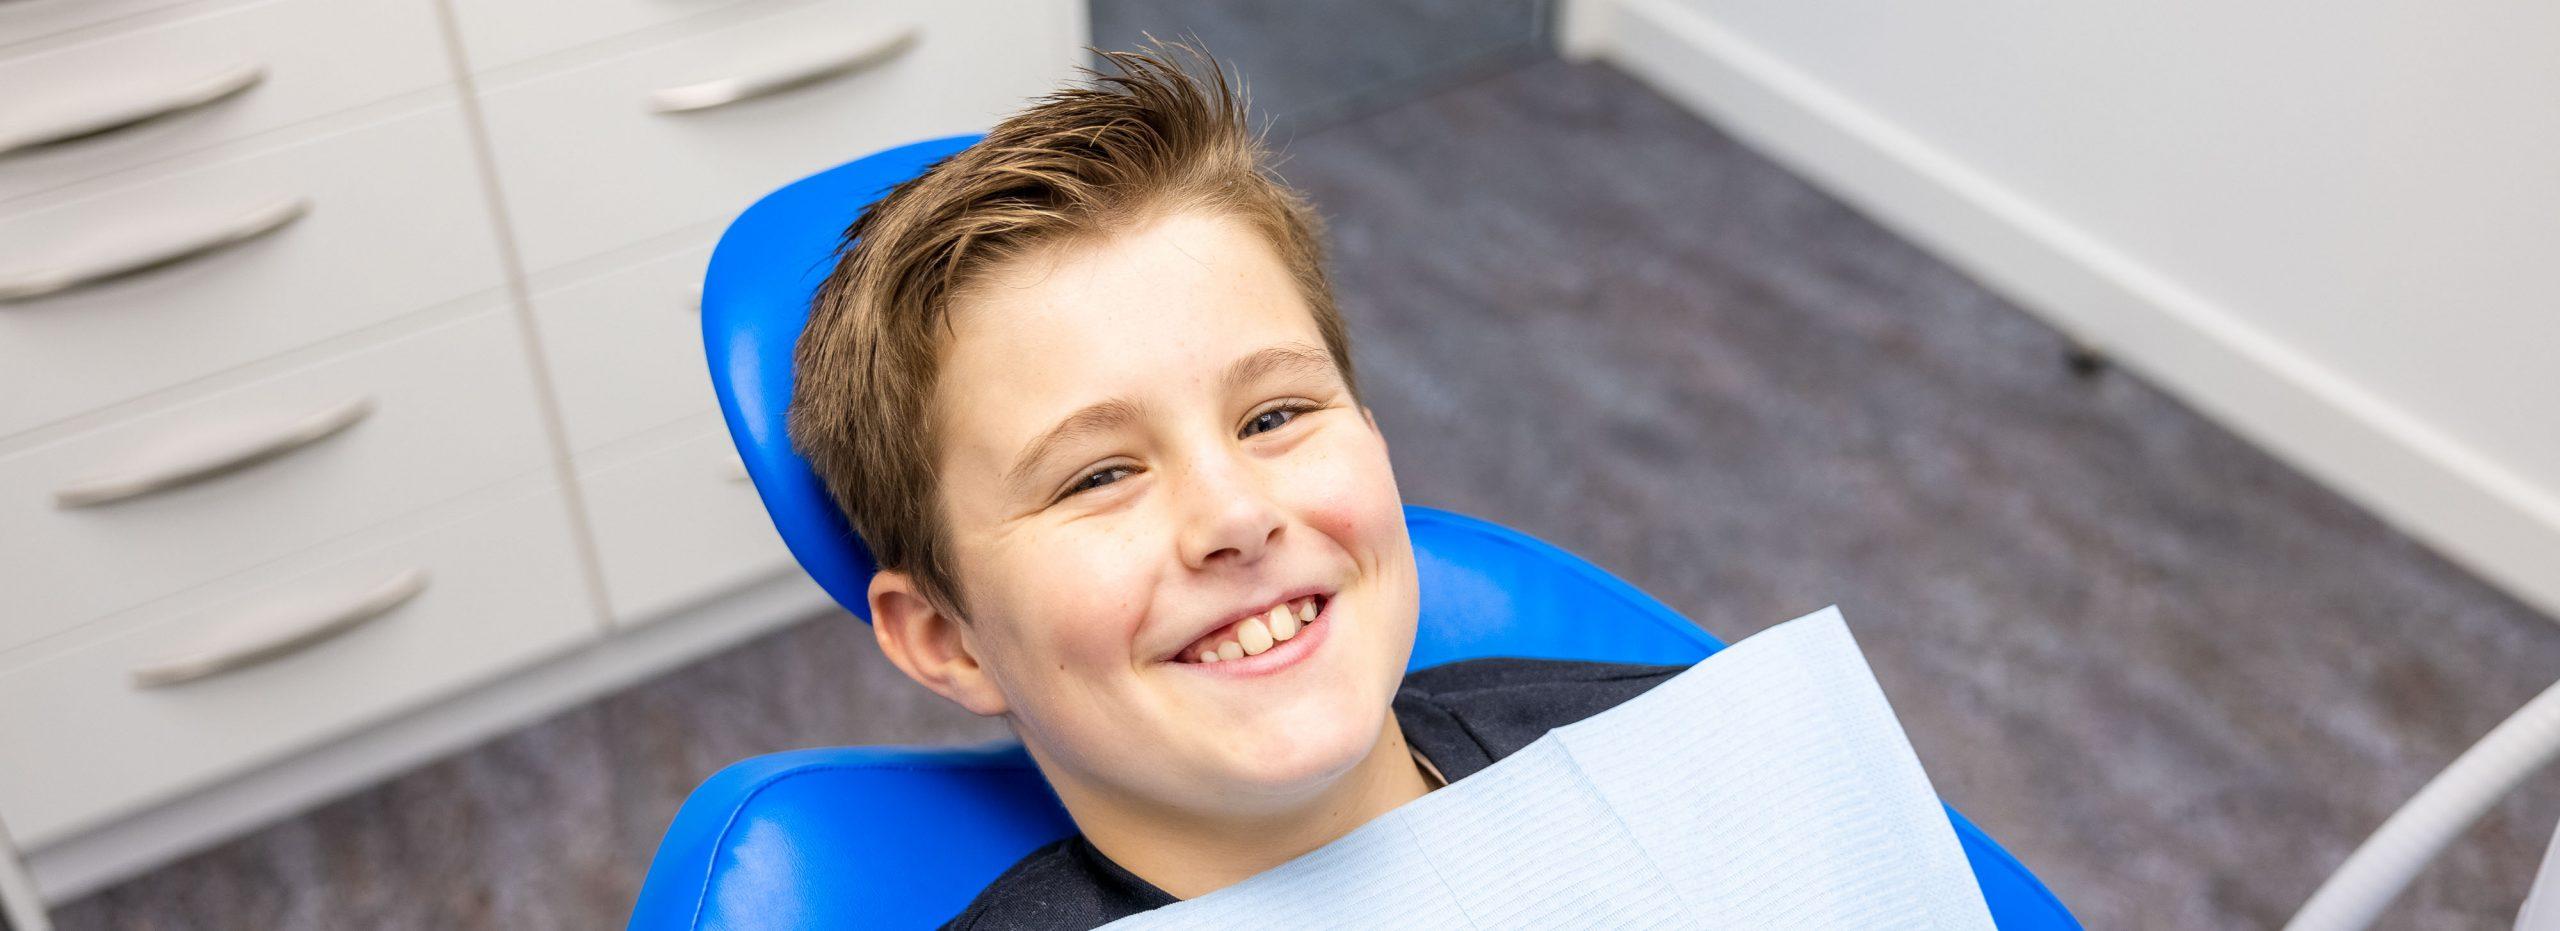 Tandartspraktijk hoflaan tandartsen 21 scaled